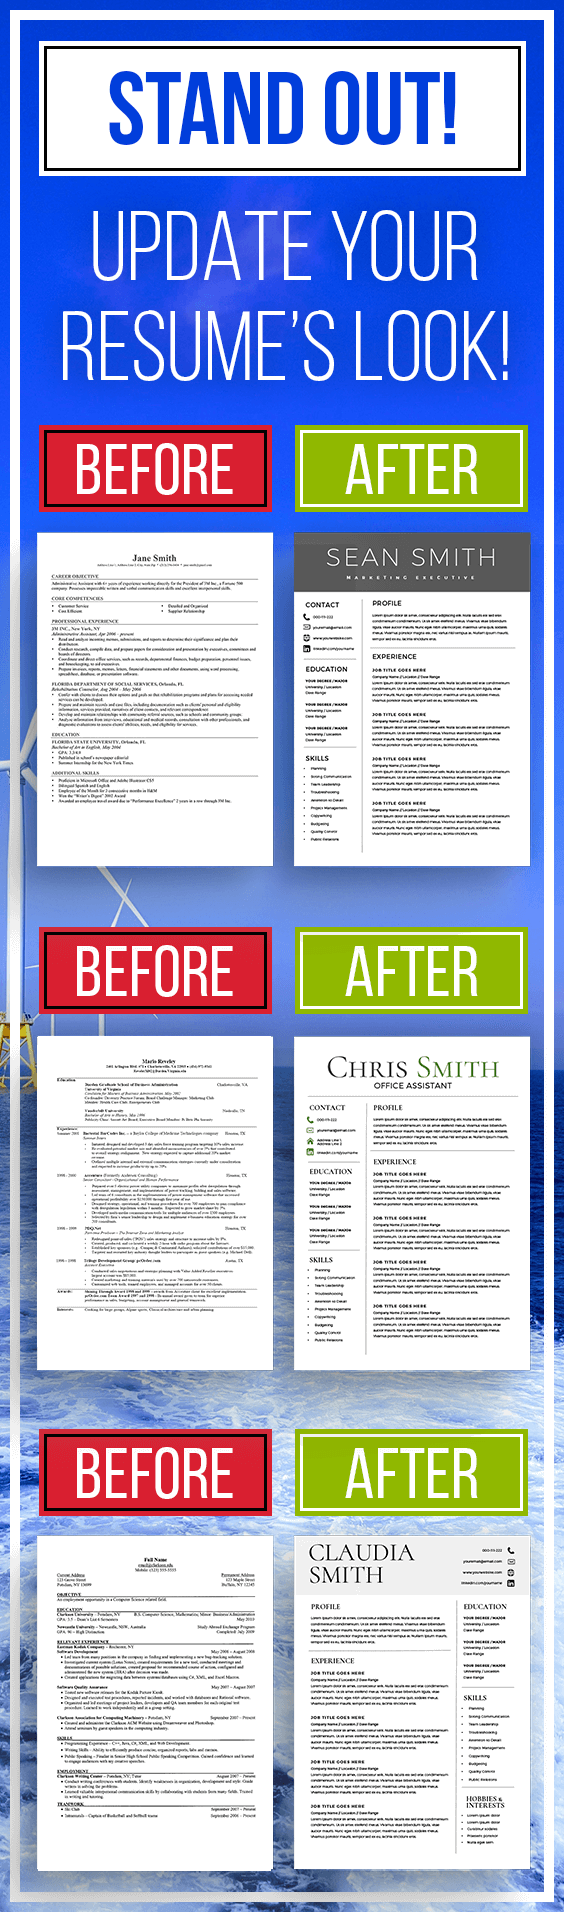 Update Your Resume S Look Resume Update Post Resume Resume